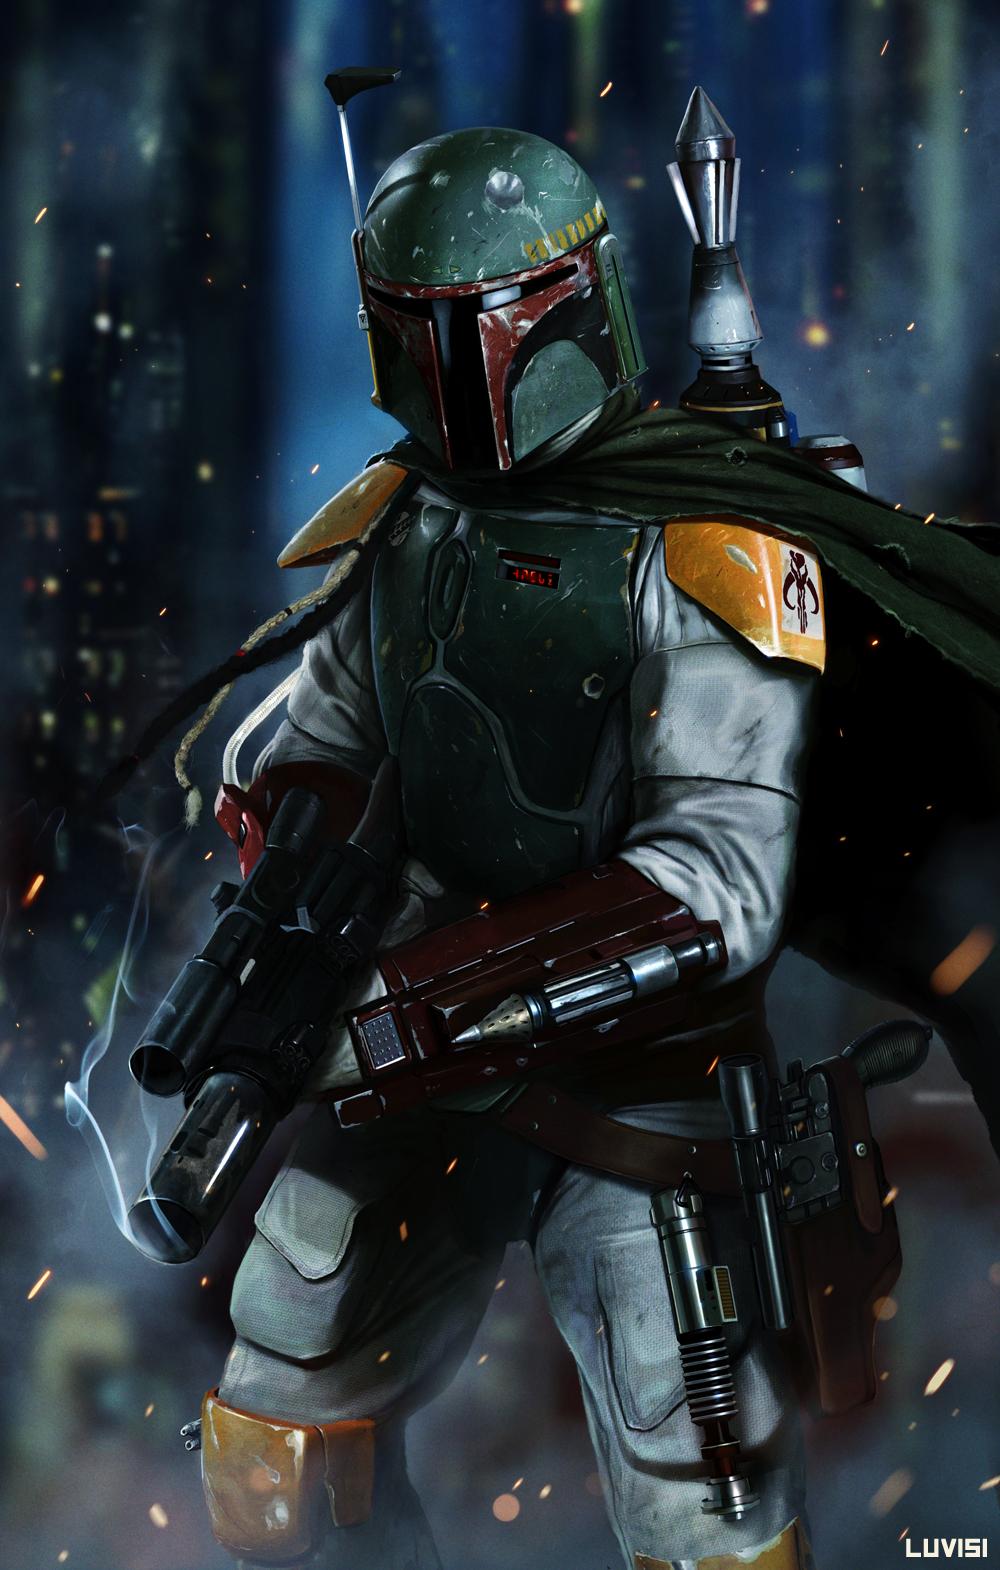 boba_fett___no_disintegrations_by_adonihs-d2yz3ss.jpg - Star Wars: The Old Republic